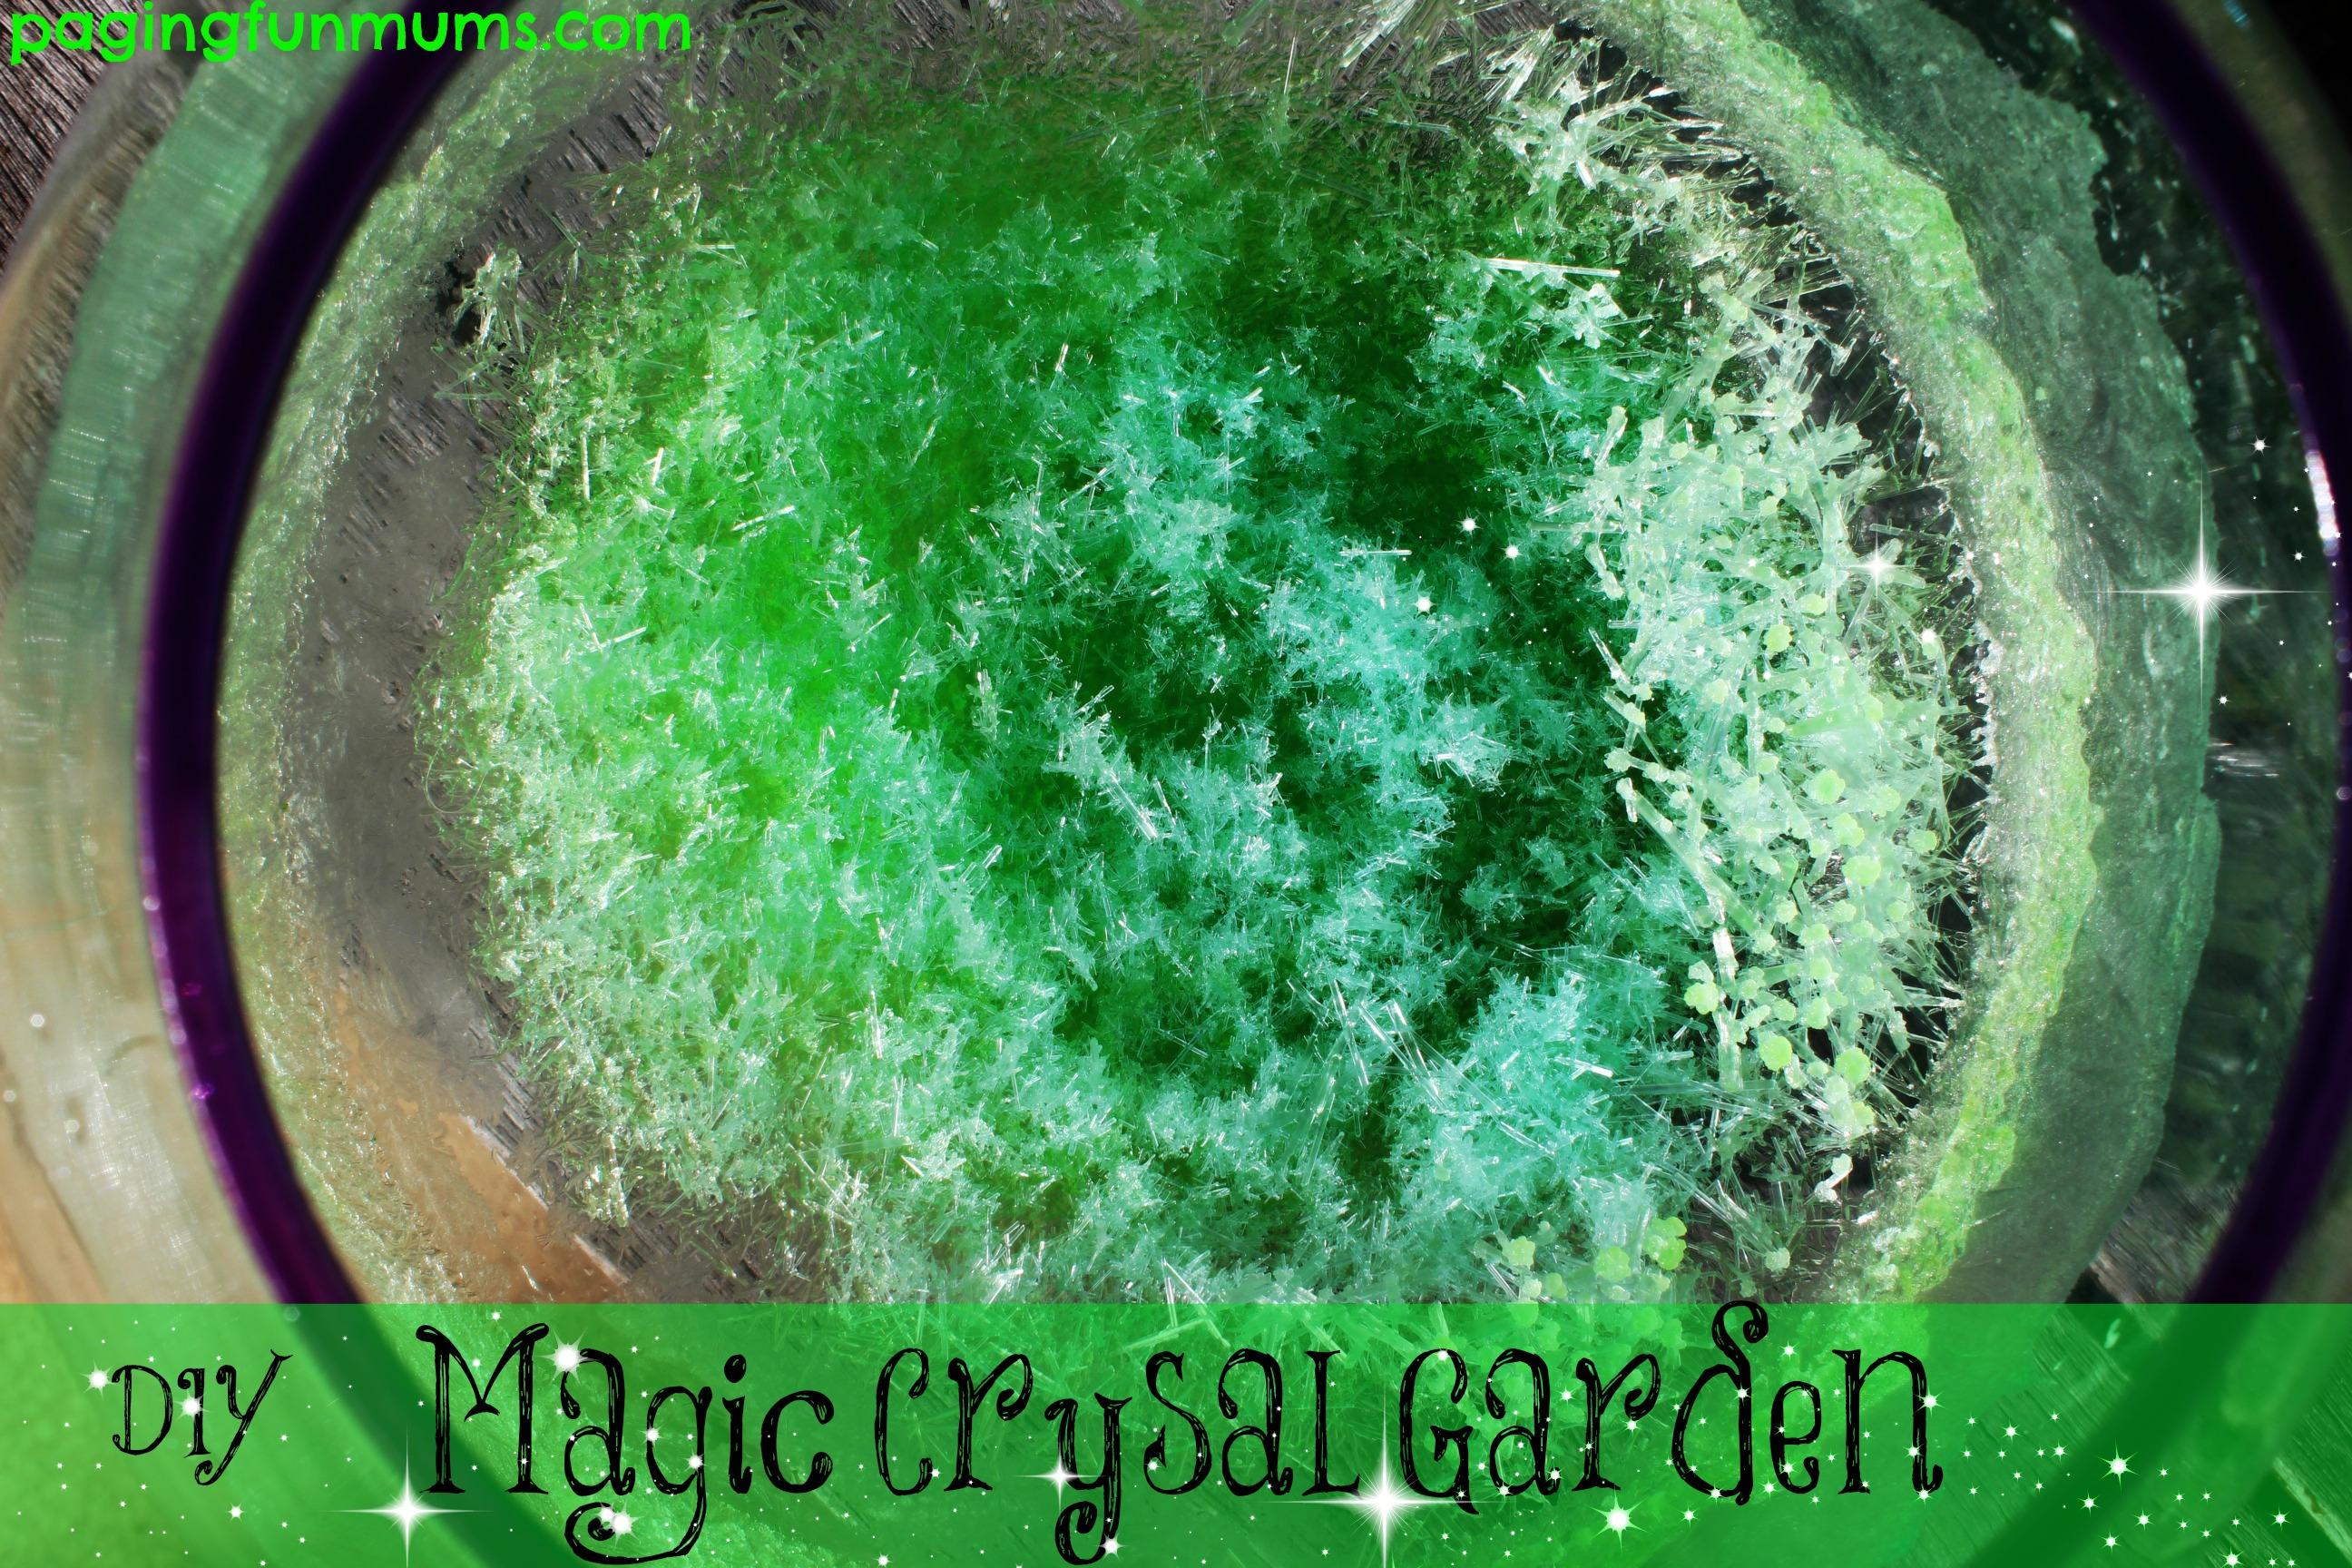 Diy Magic Crystal Garden